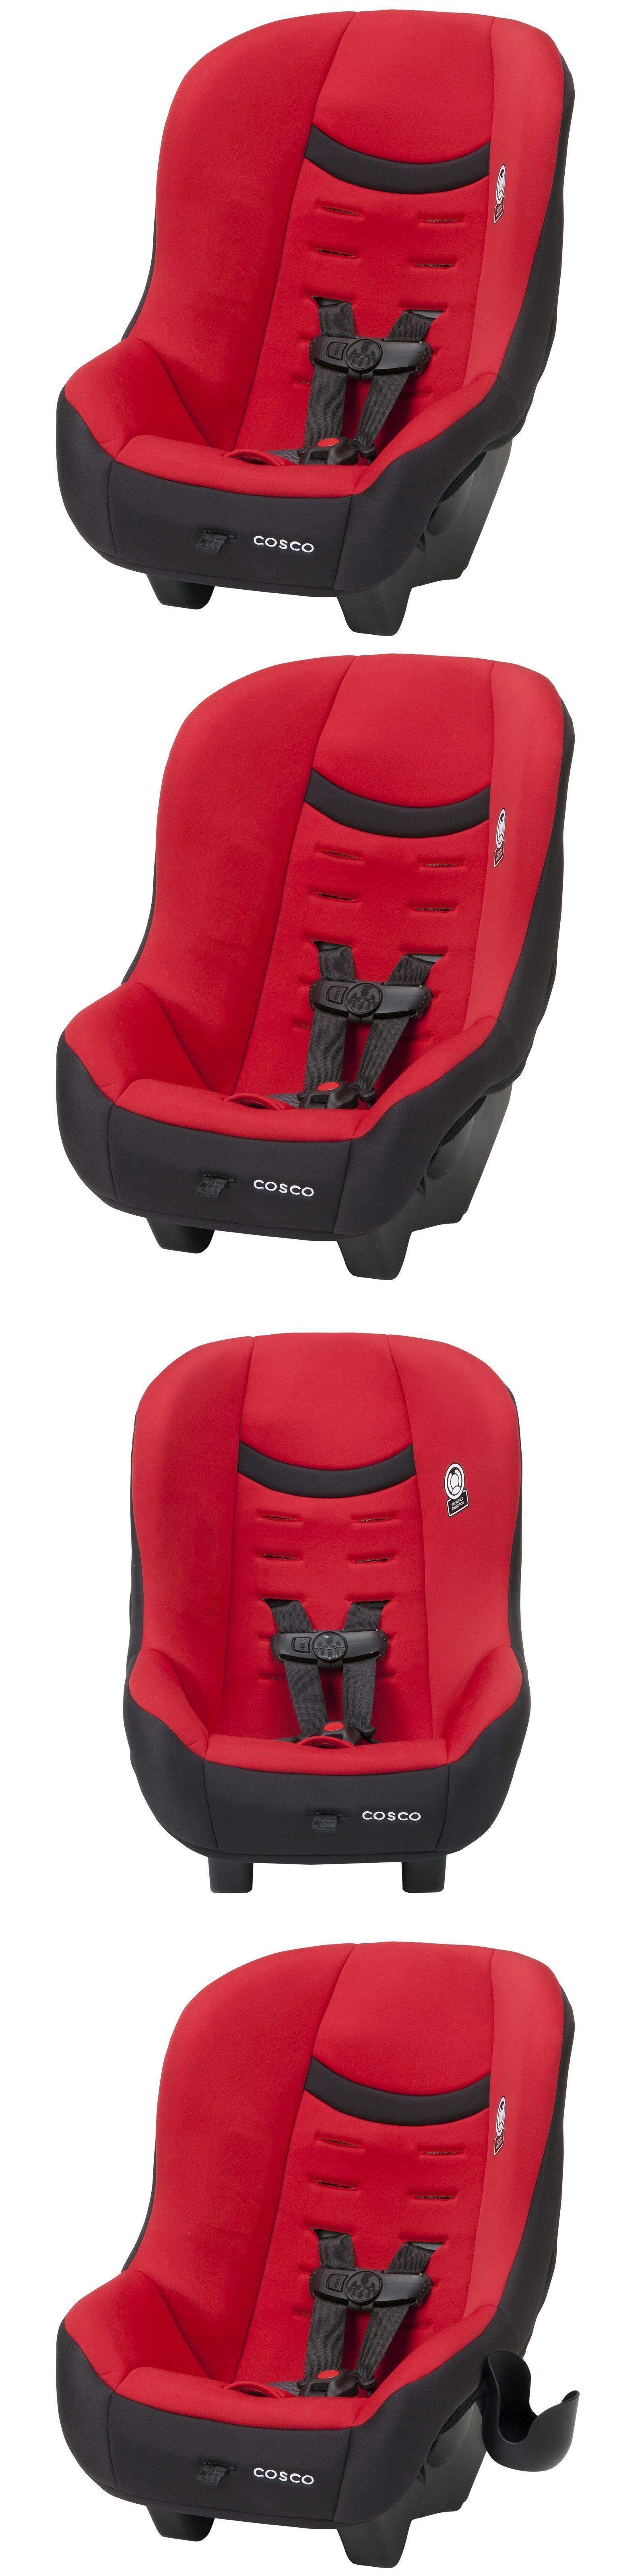 Convertible Car Seat 5 40lbs 66695 Cosco Scenera Next Baby Toddler